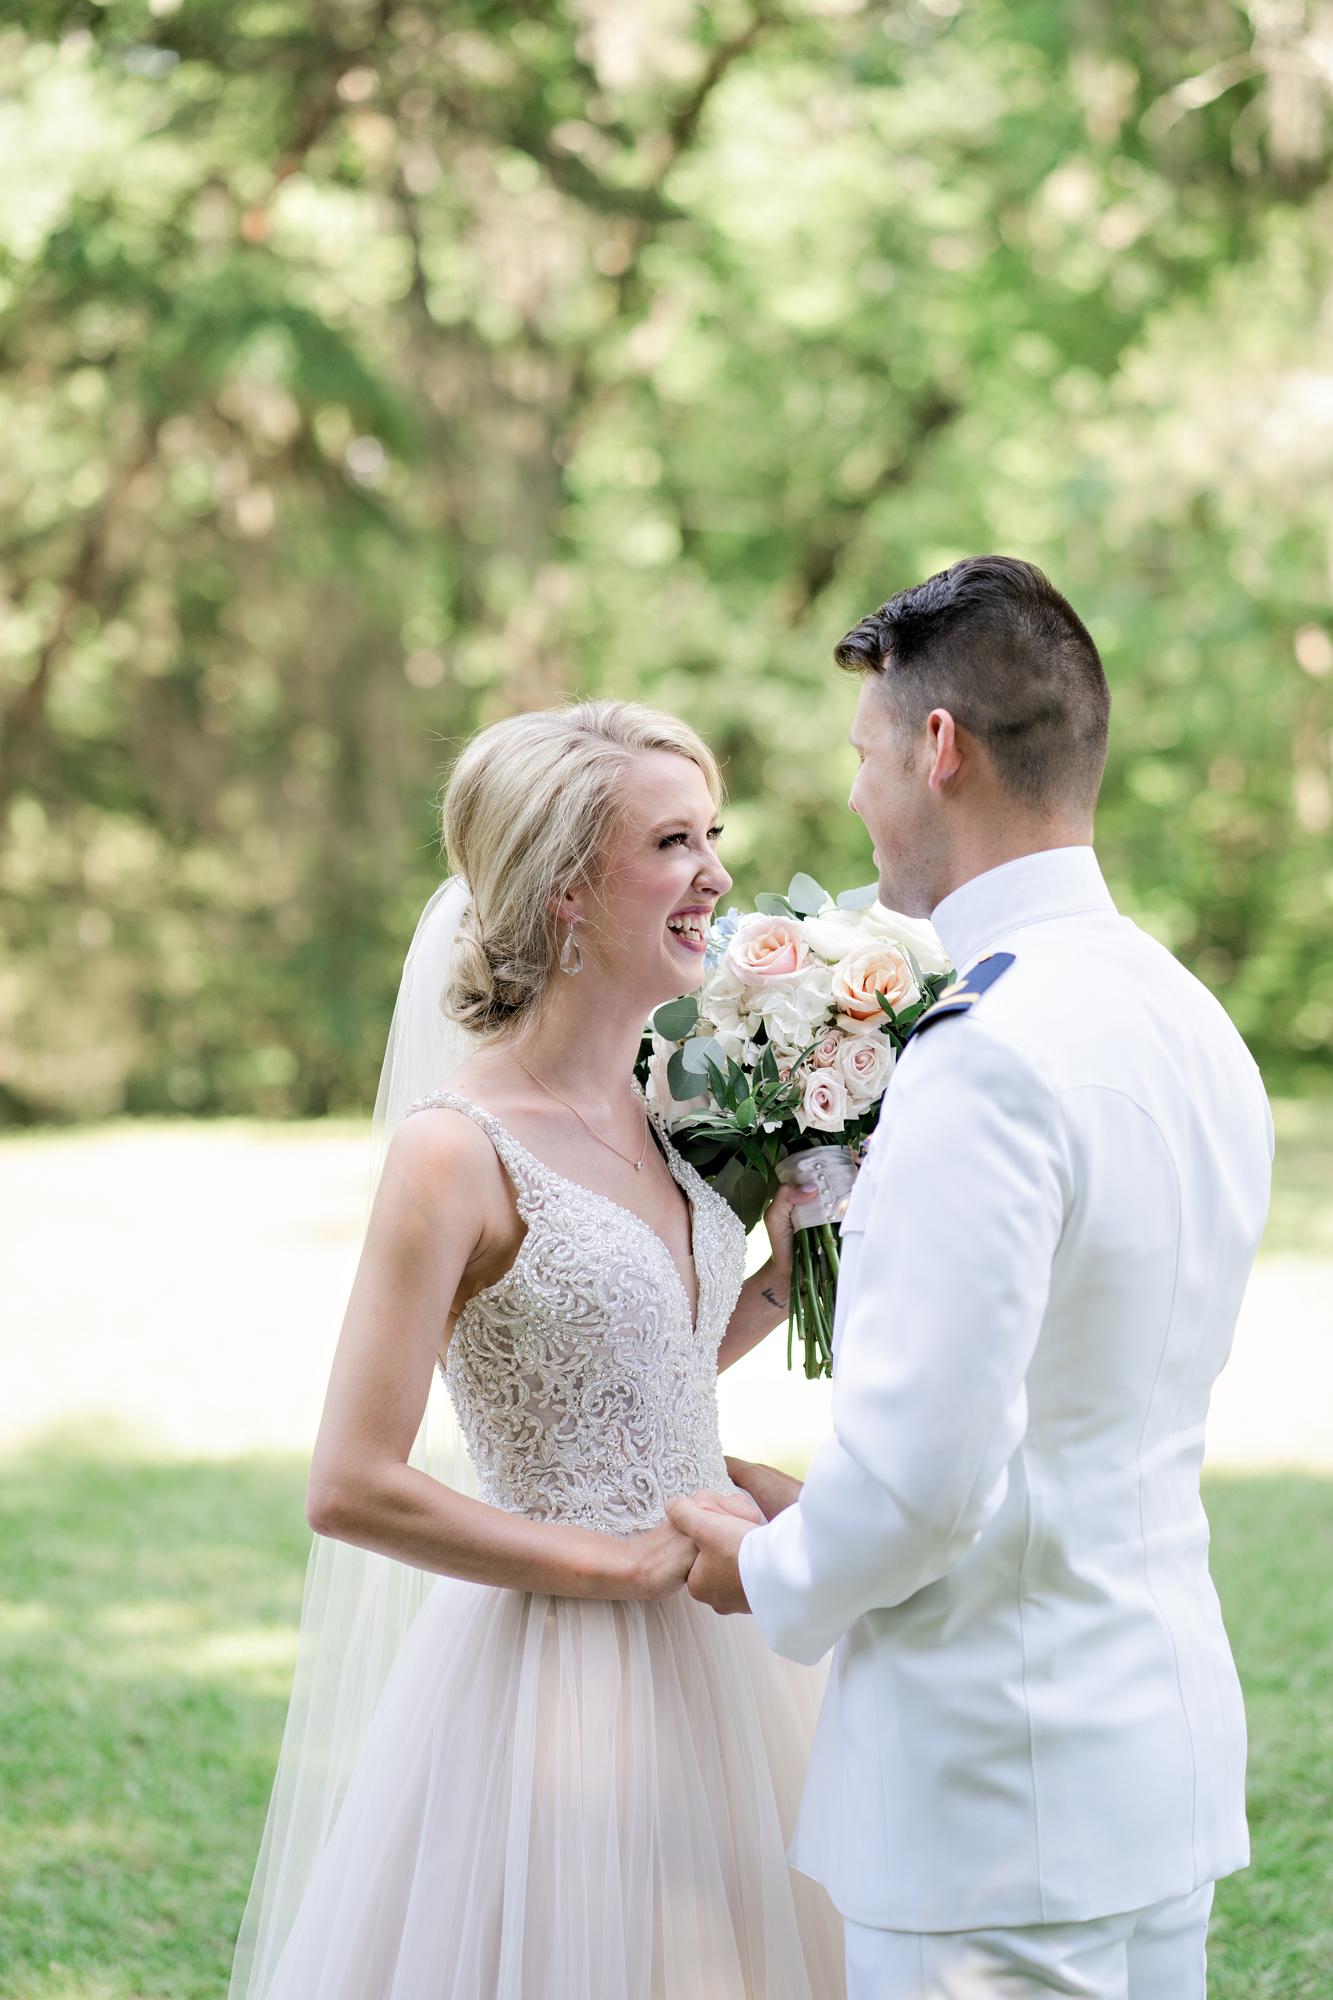 Alabama-Photographers-Nick-Drollette-Wedding-Photography-116.jpg